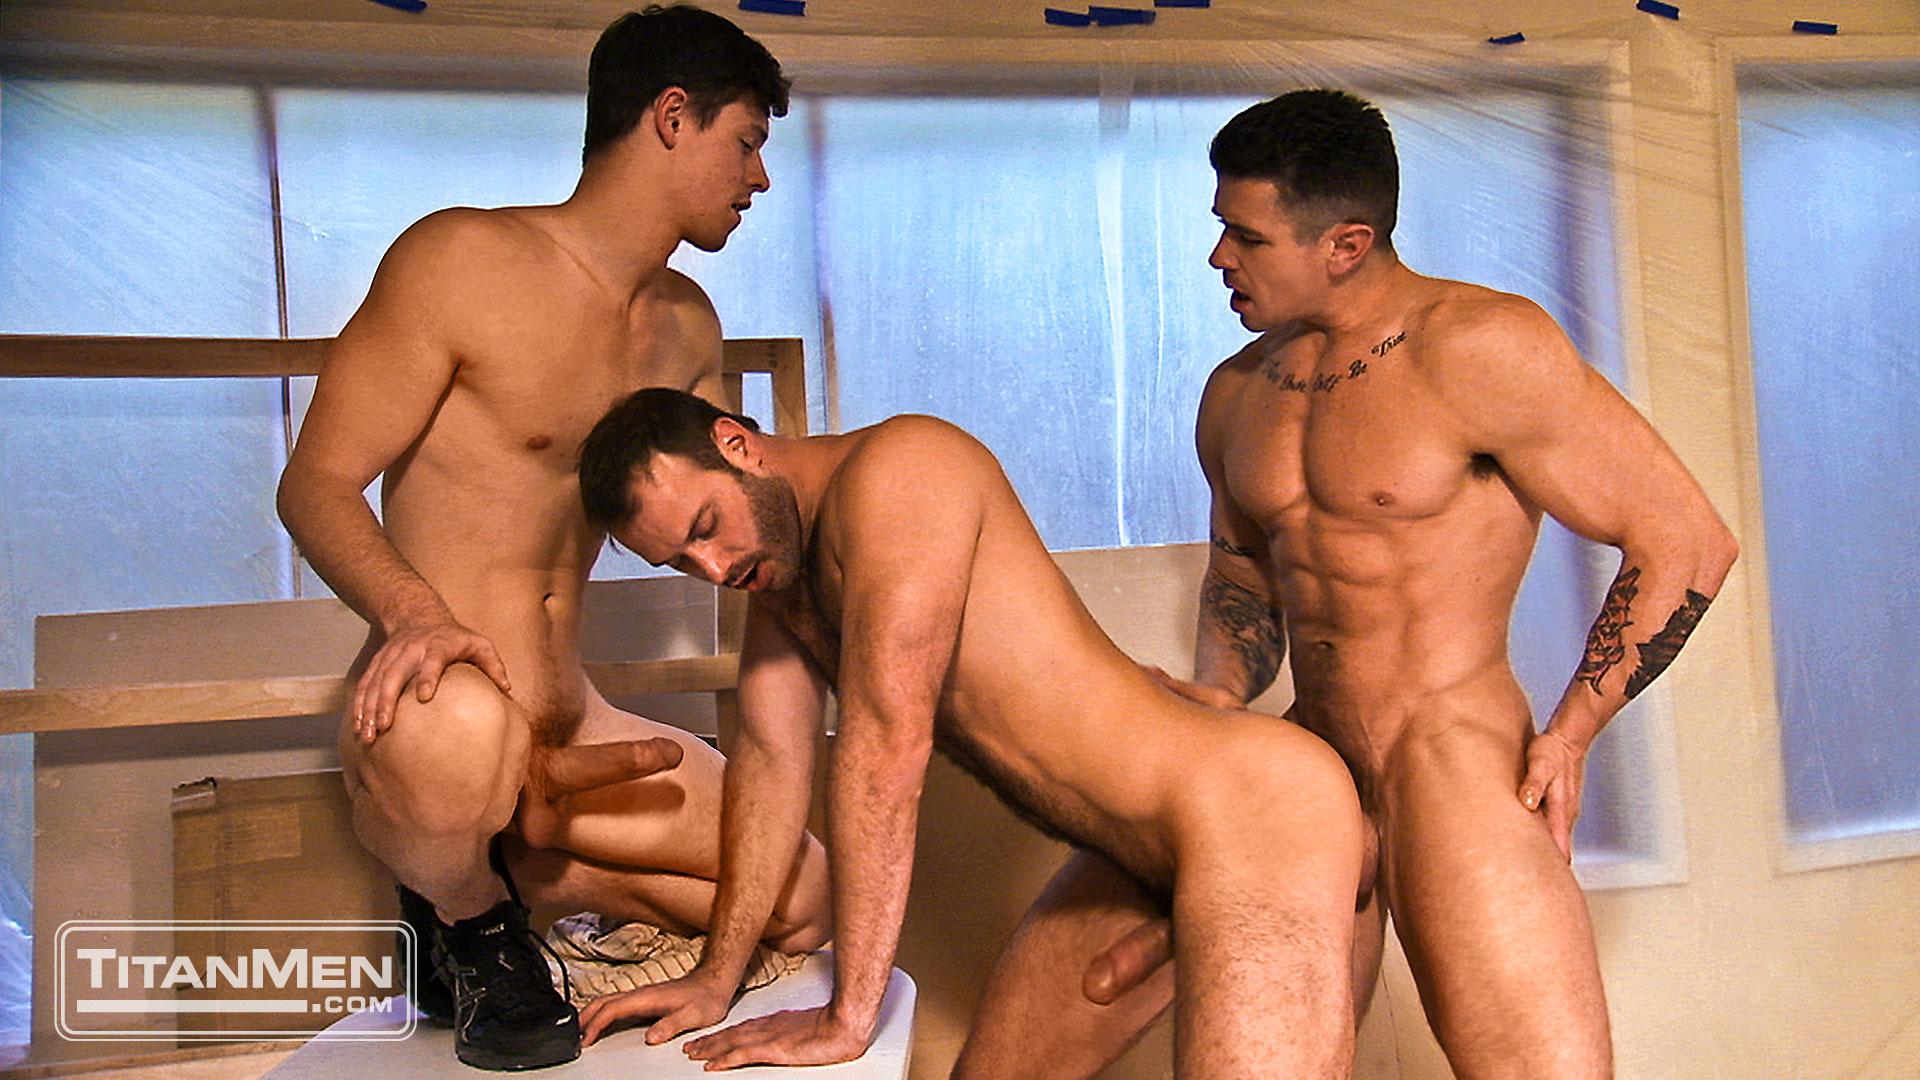 Pron&photo sex gay porn tube